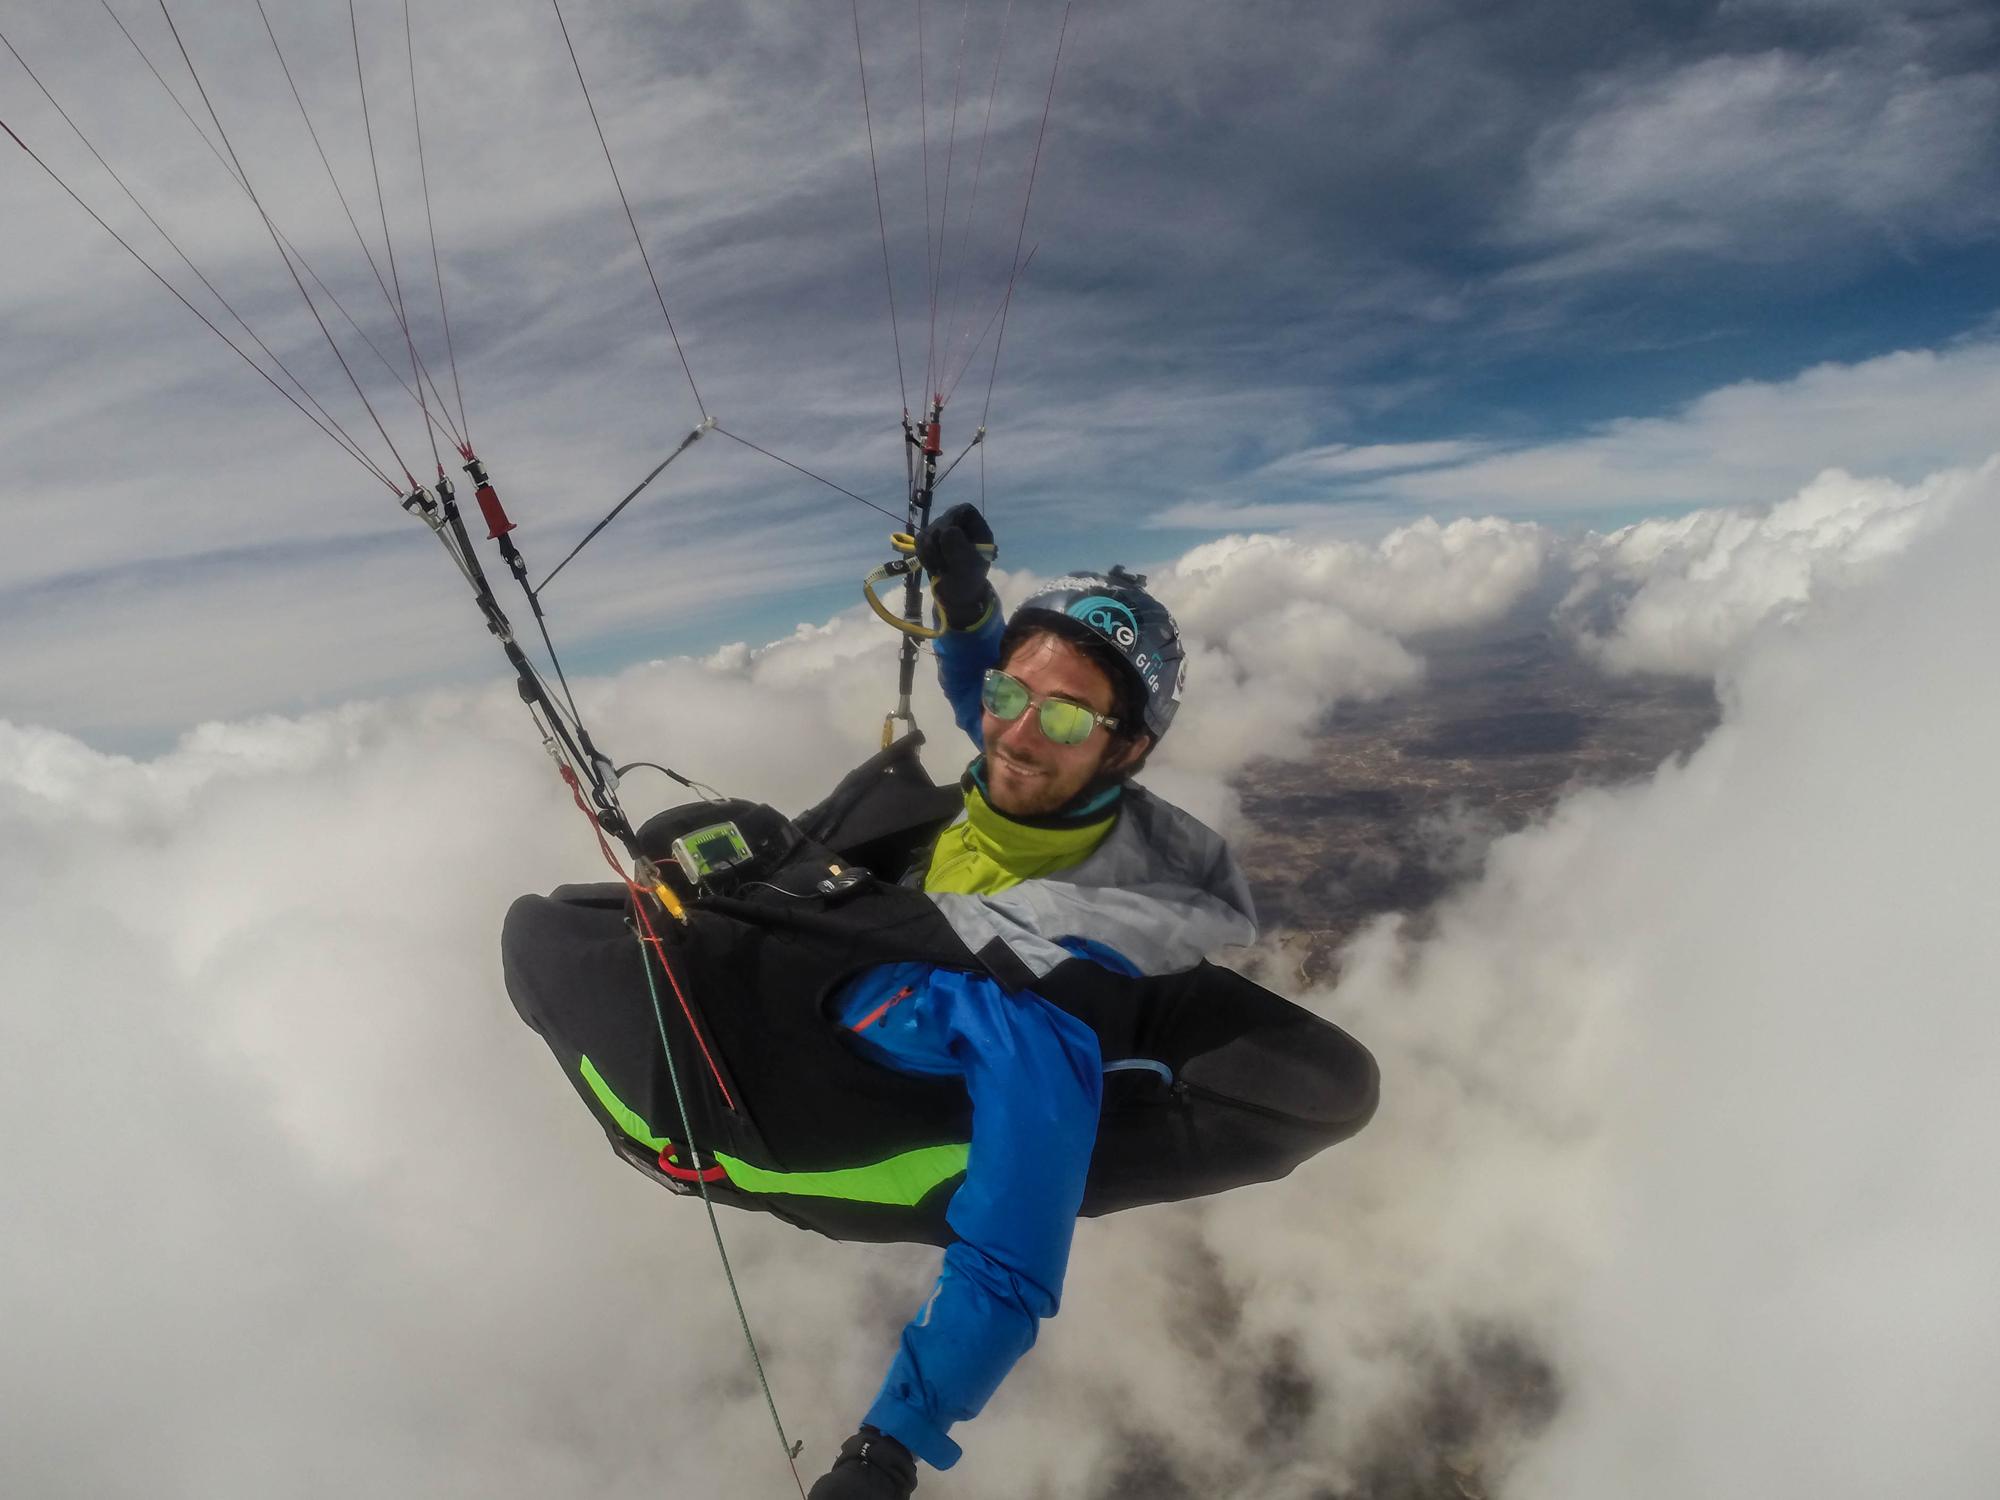 Brazil quixada expe parapente above the clouds Francois Ragolski